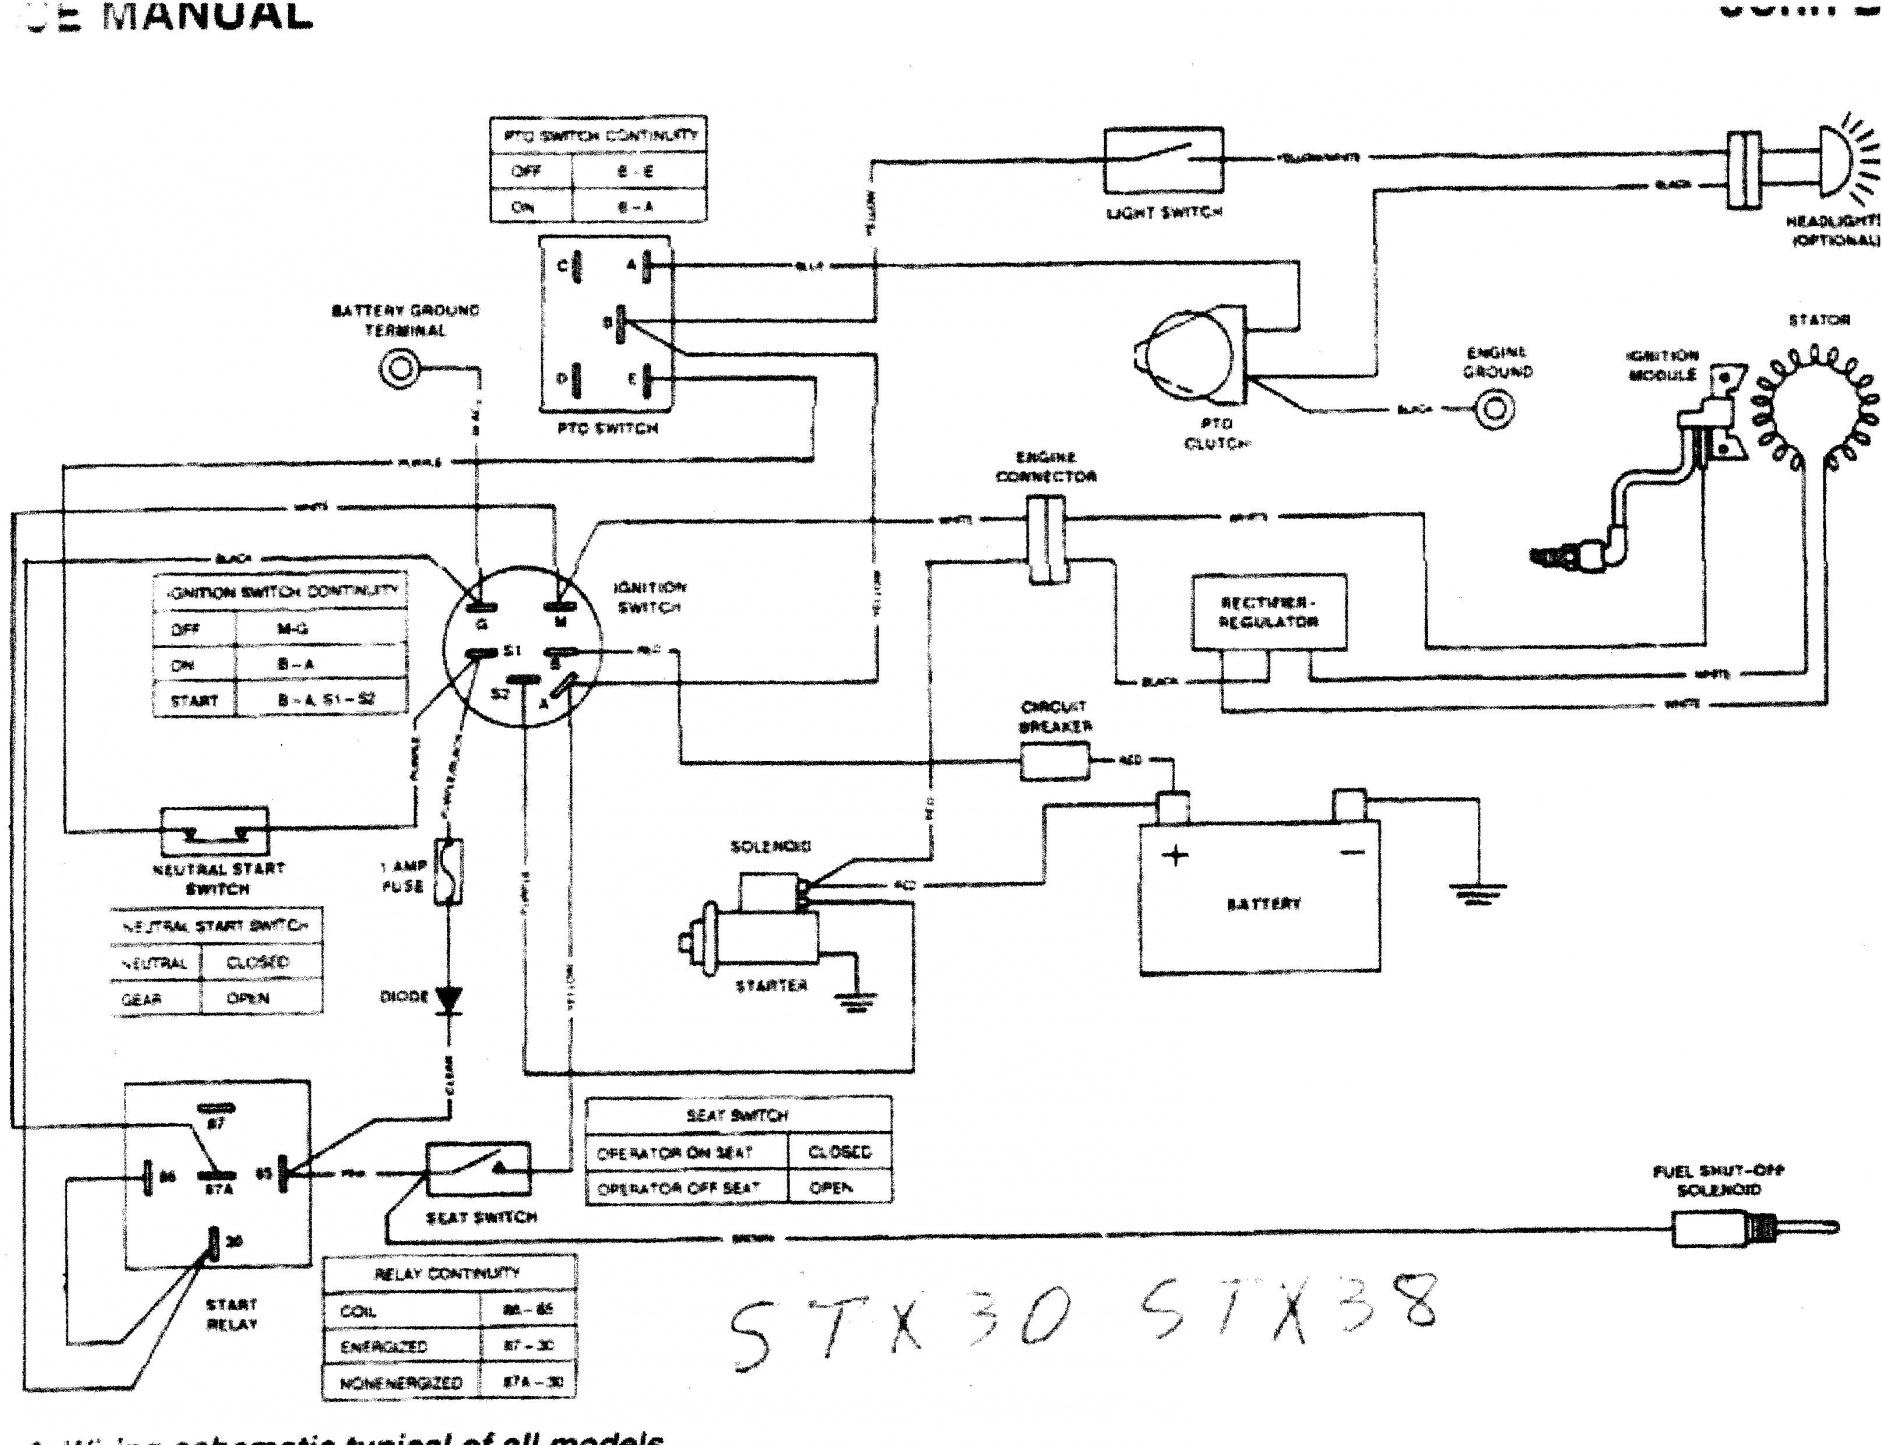 john deere wiring diagram symbols - wiring diagram, Wiring diagram